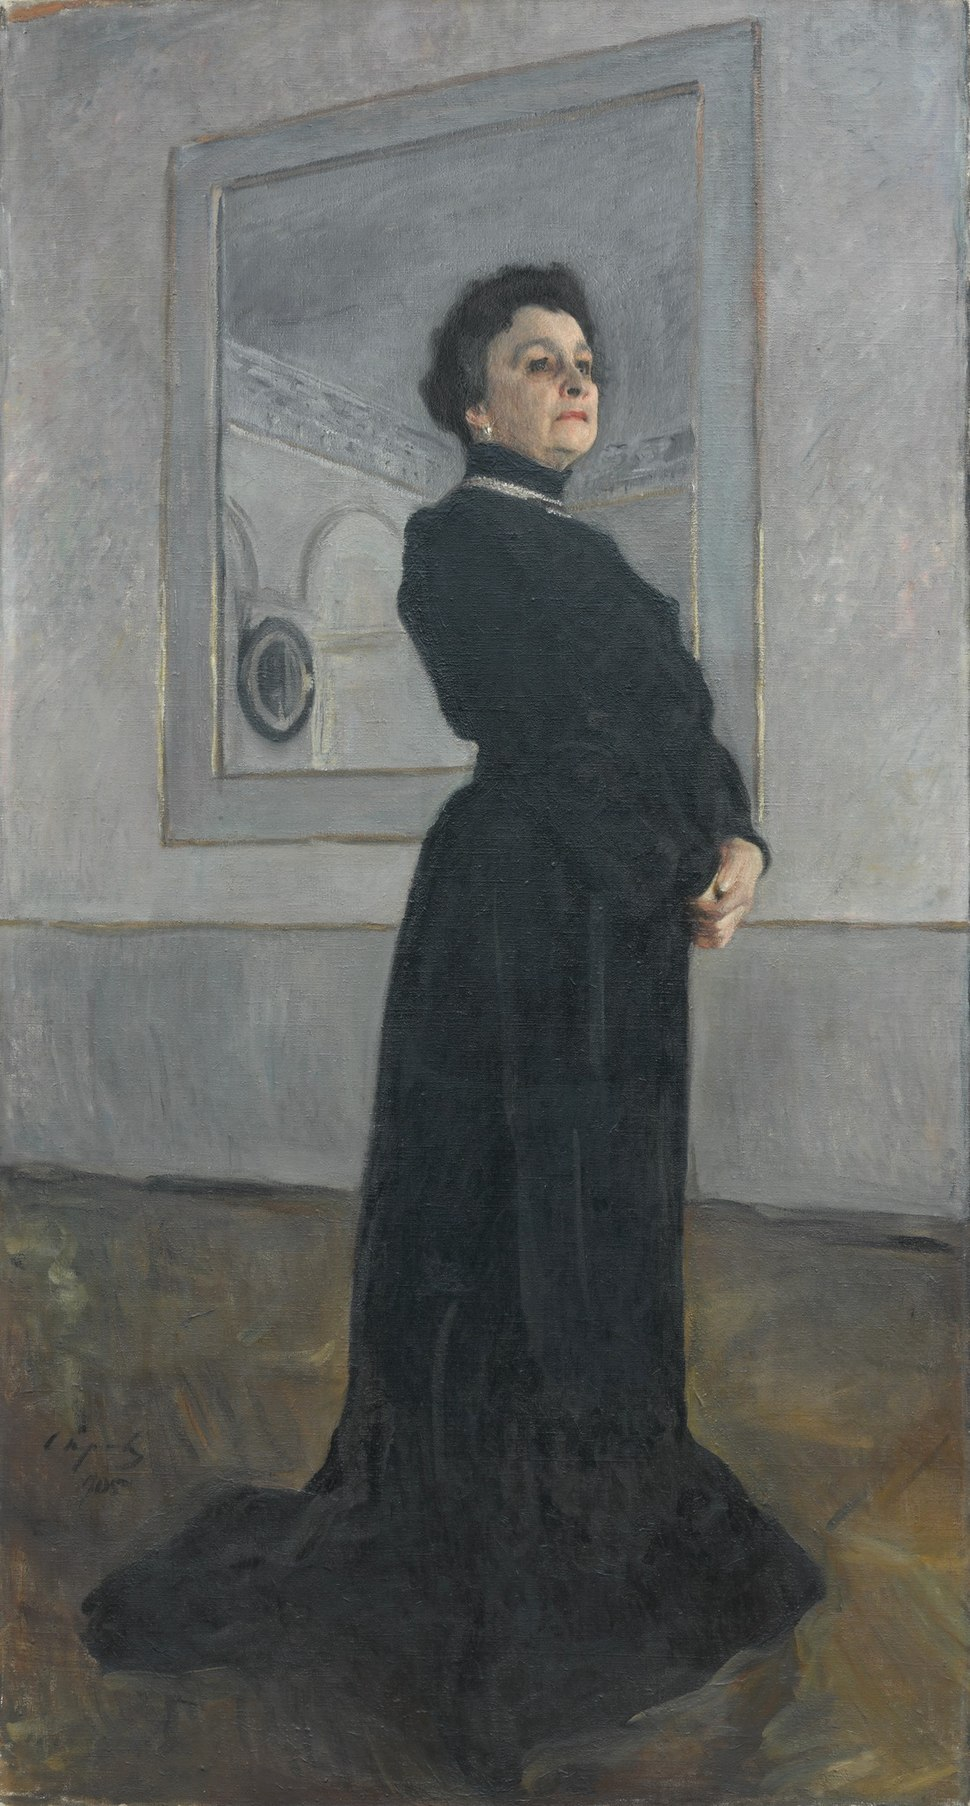 Yermolova